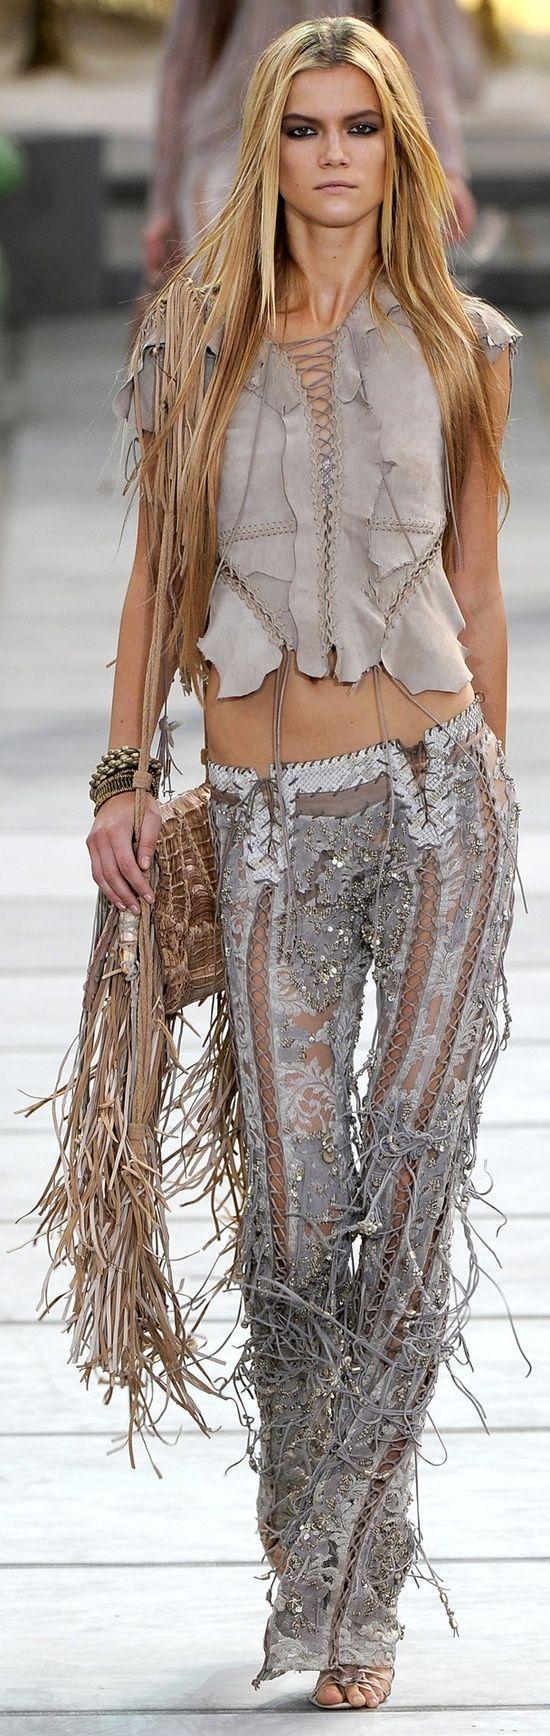 Boho Fashion Tumblr Trends